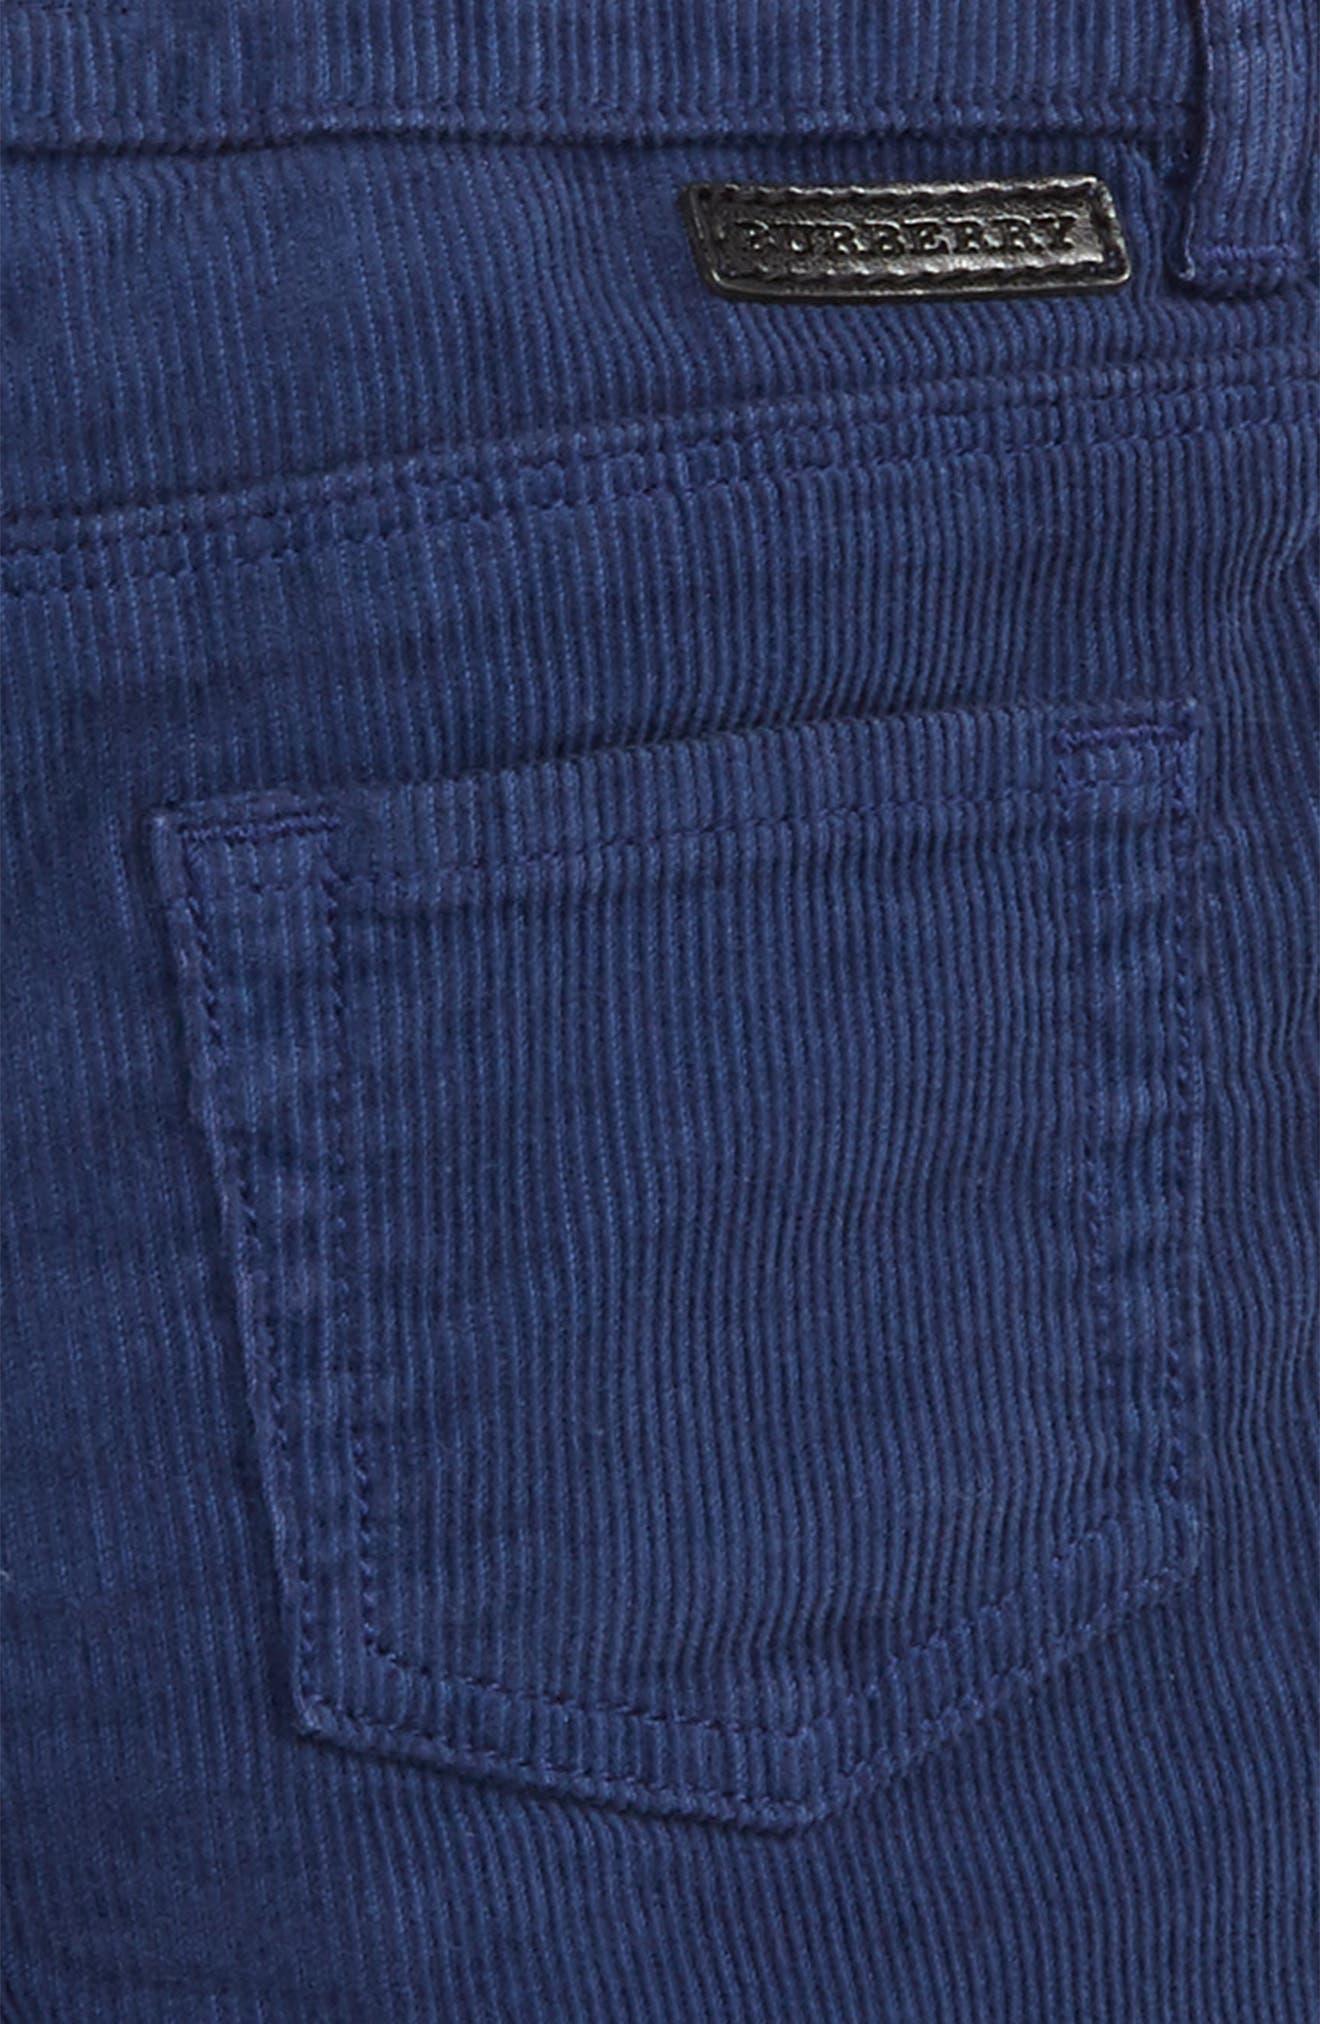 Langston Corduroy Skinny Pants,                             Alternate thumbnail 3, color,                             Blue